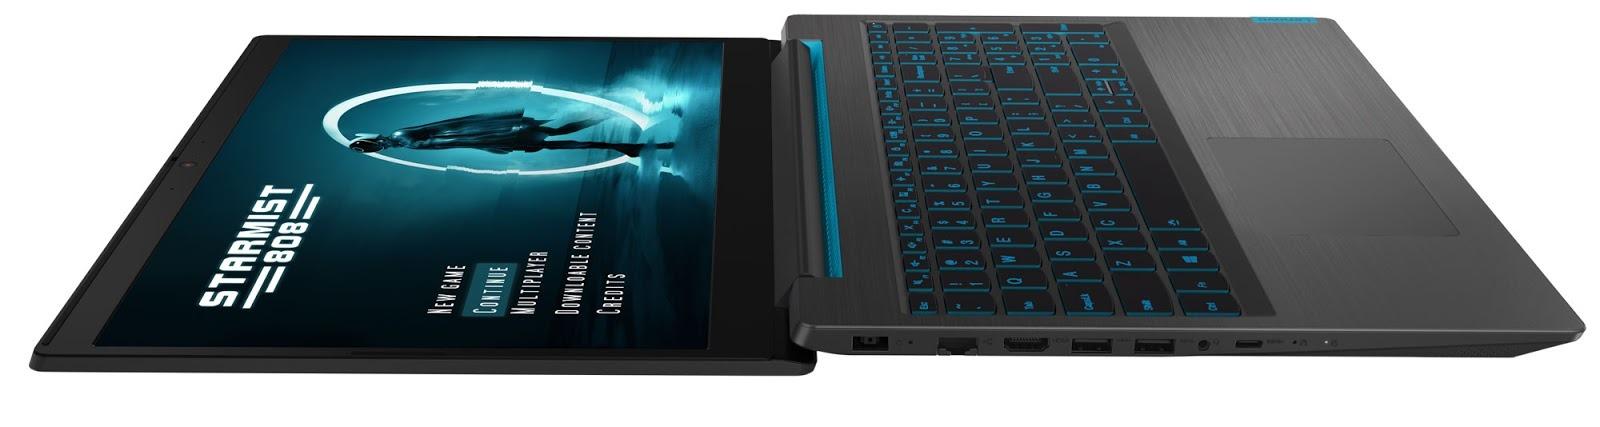 Фото 5. Ноутбук Lenovo ideapad L340-15IRH Gaming (81LK00QWRE)